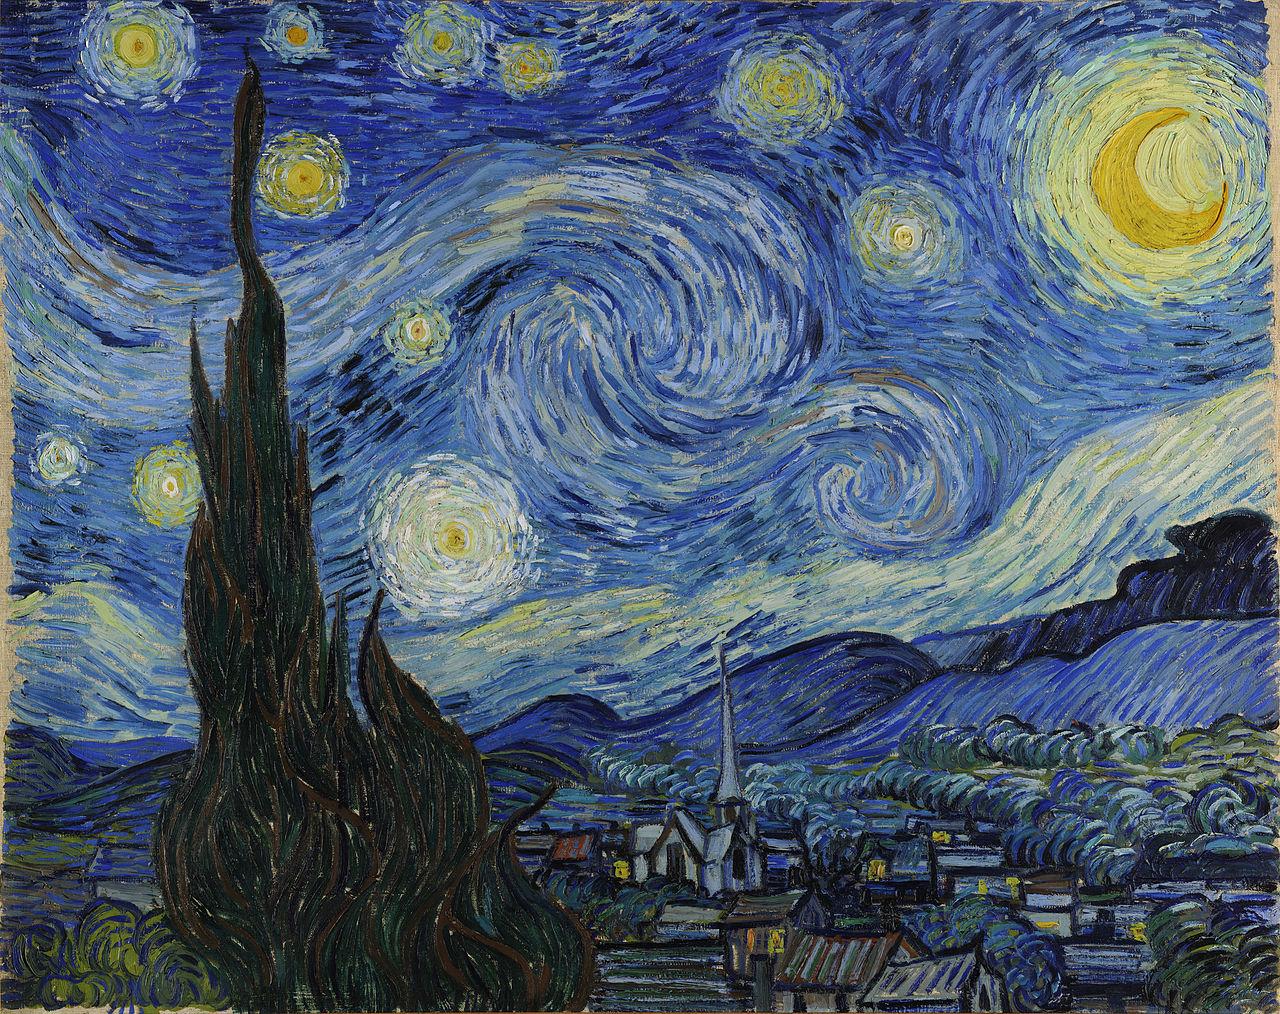 1280px-Van_Gogh_-_Starry_Night_-_Google_Art_Project.jpg